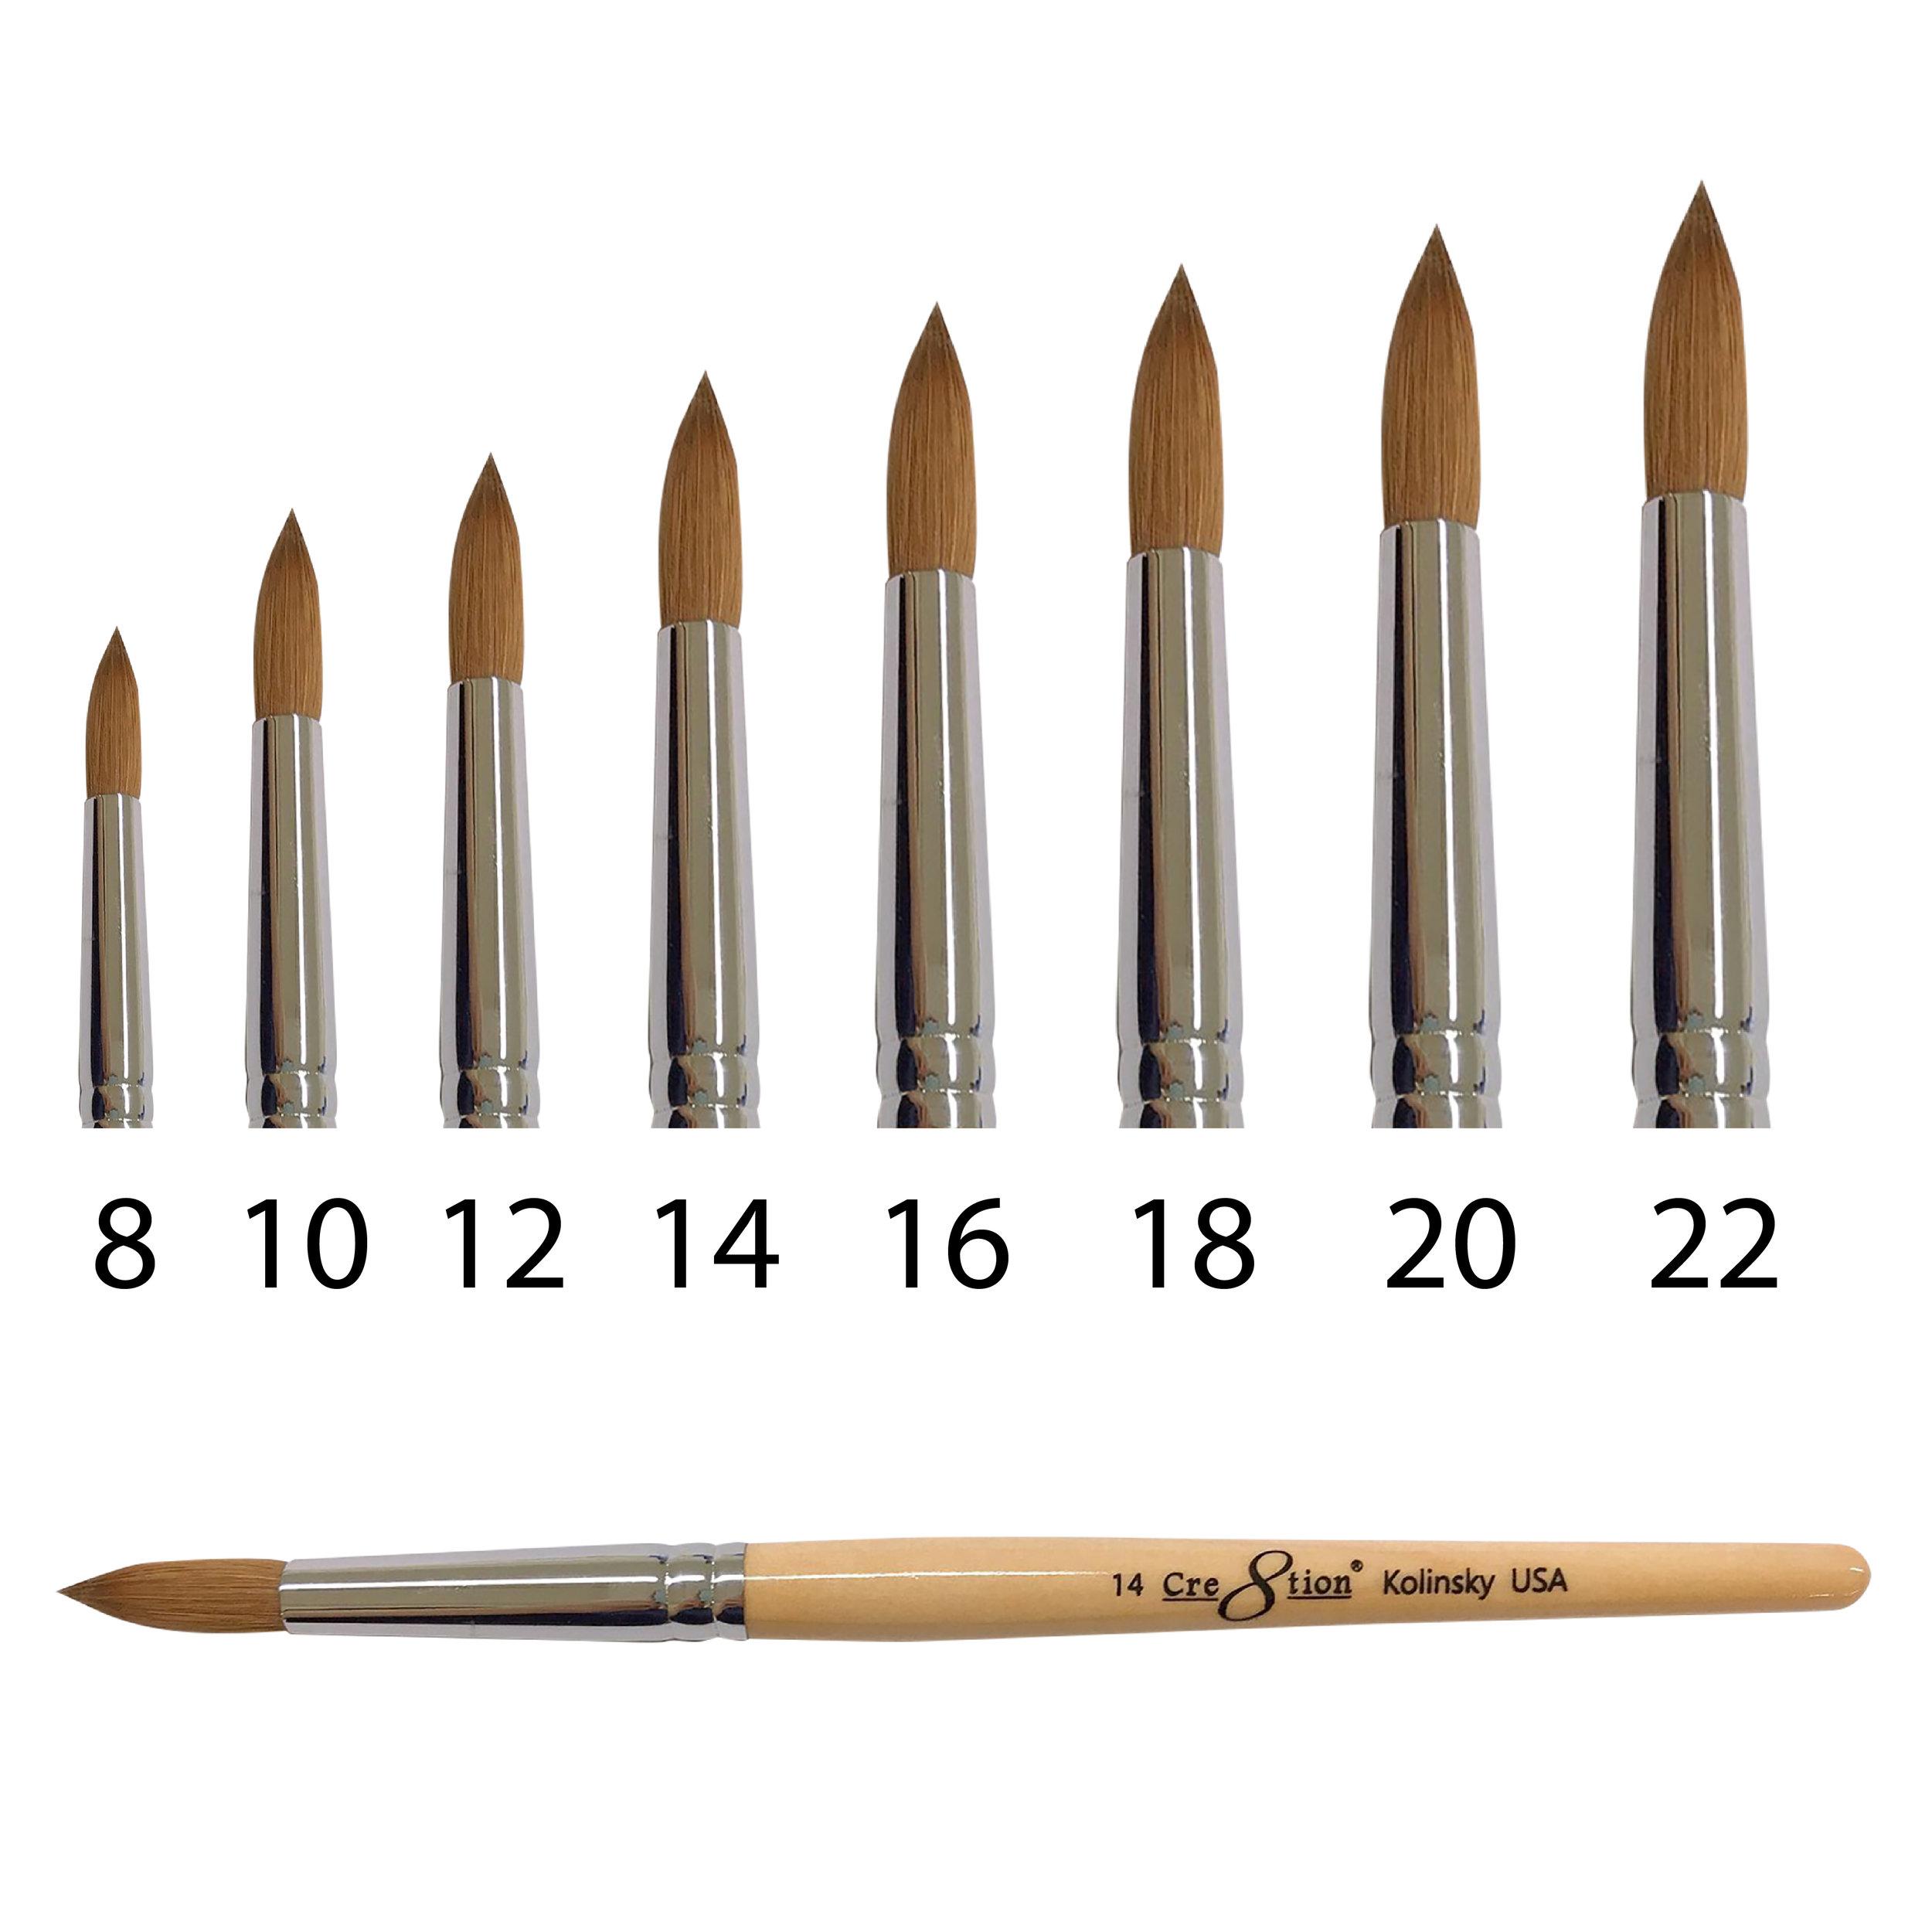 Kolinsky Acrylic Brush B  150 pcs/box, 600 pcs/case  12134 - Size 08 12135 - Size 10 12136 - Size 12 12137 - Size 14 12138 - Size 16 12139 - Size 18 12140 - Size 20 12141- Size 22